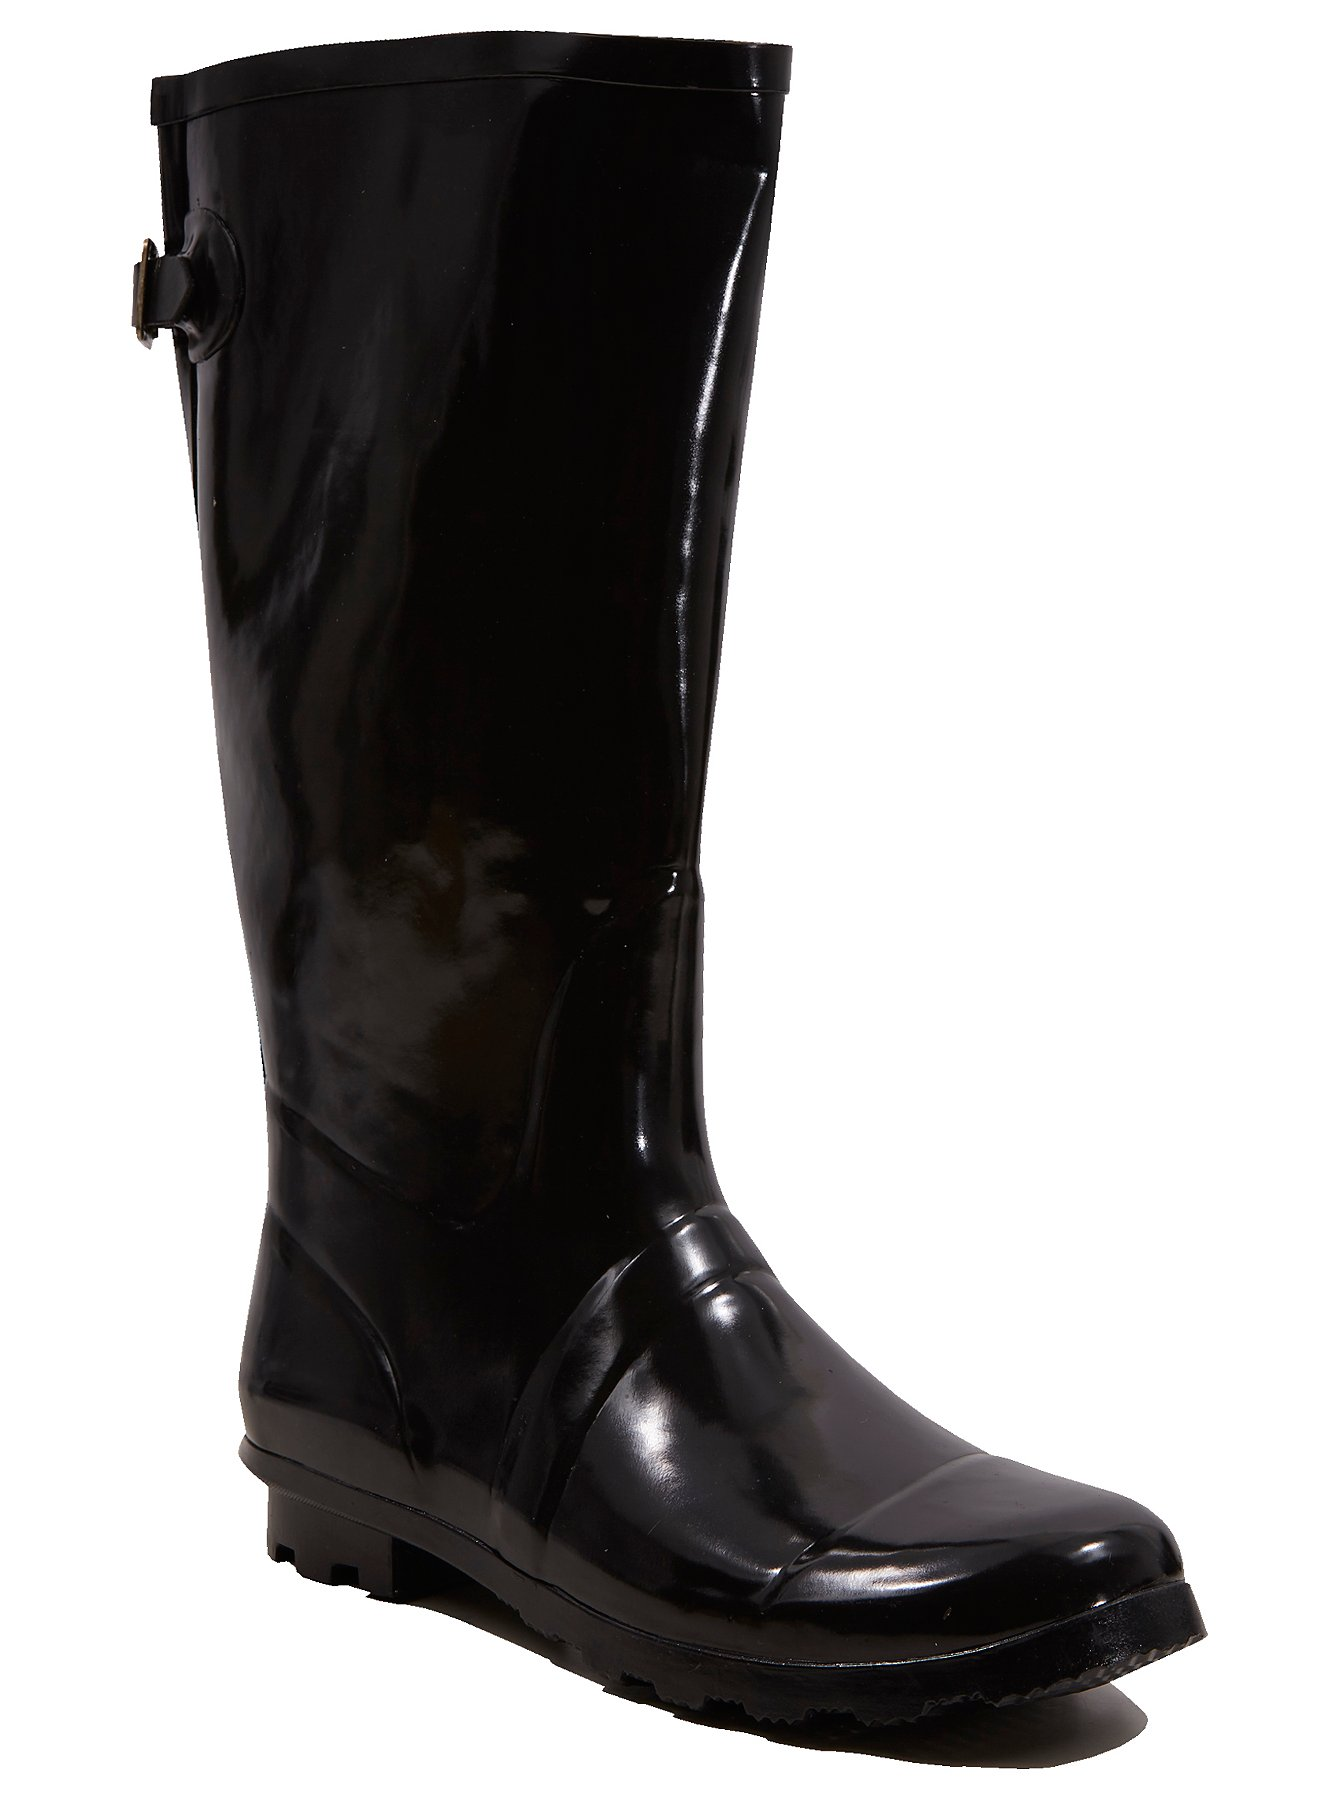 Ladies leather gloves asda - Wellington Boots